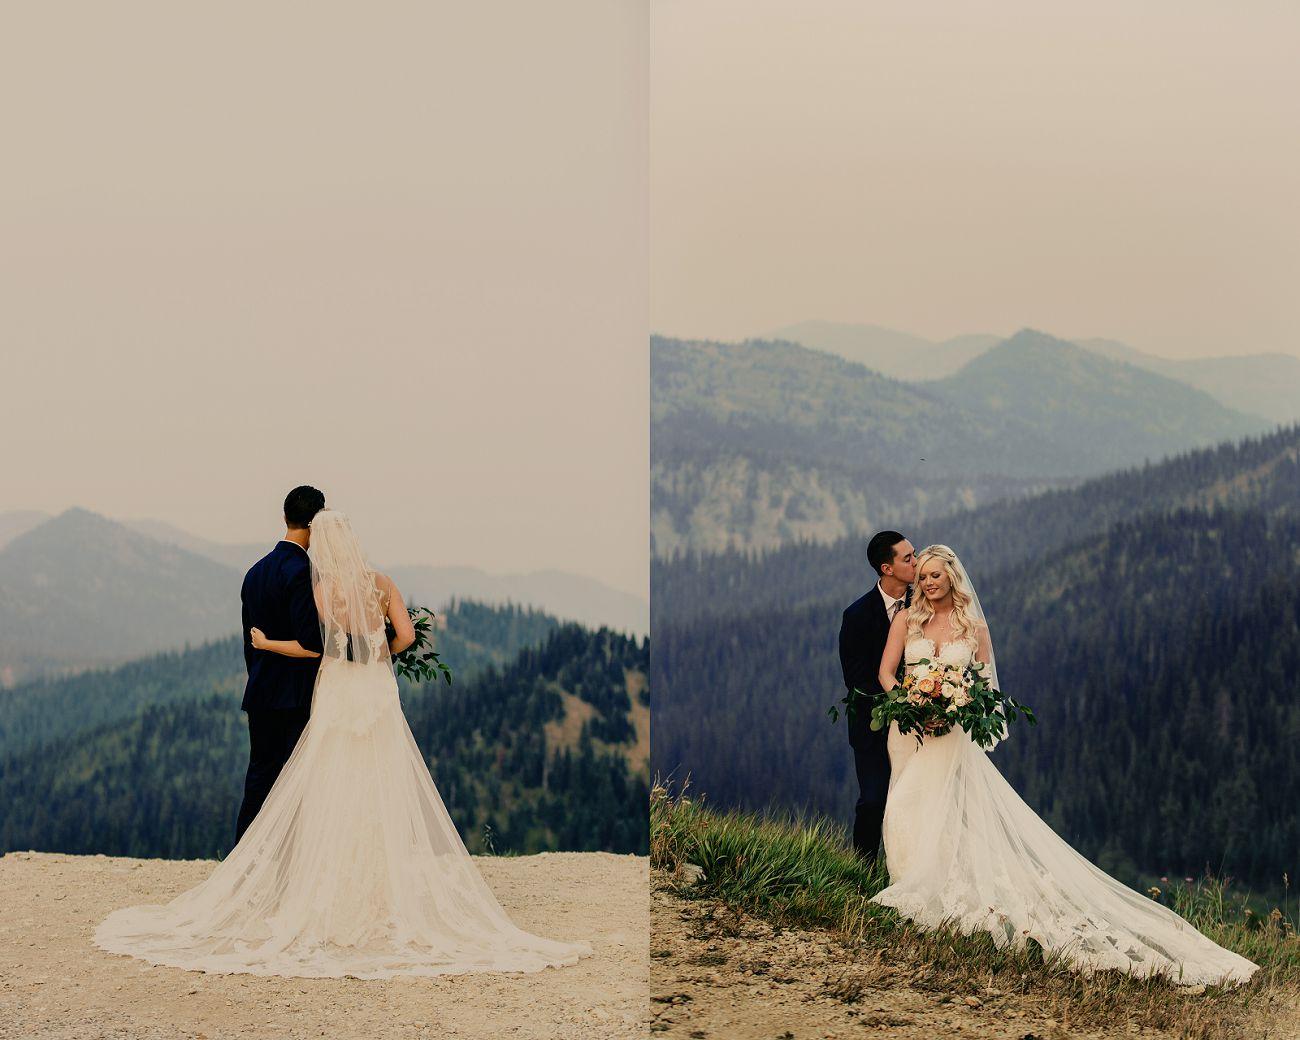 Jennifer_Mooney_Photo_Whitefish_mountain_resort_wedding_elegant_montana_wedding_015.jpg